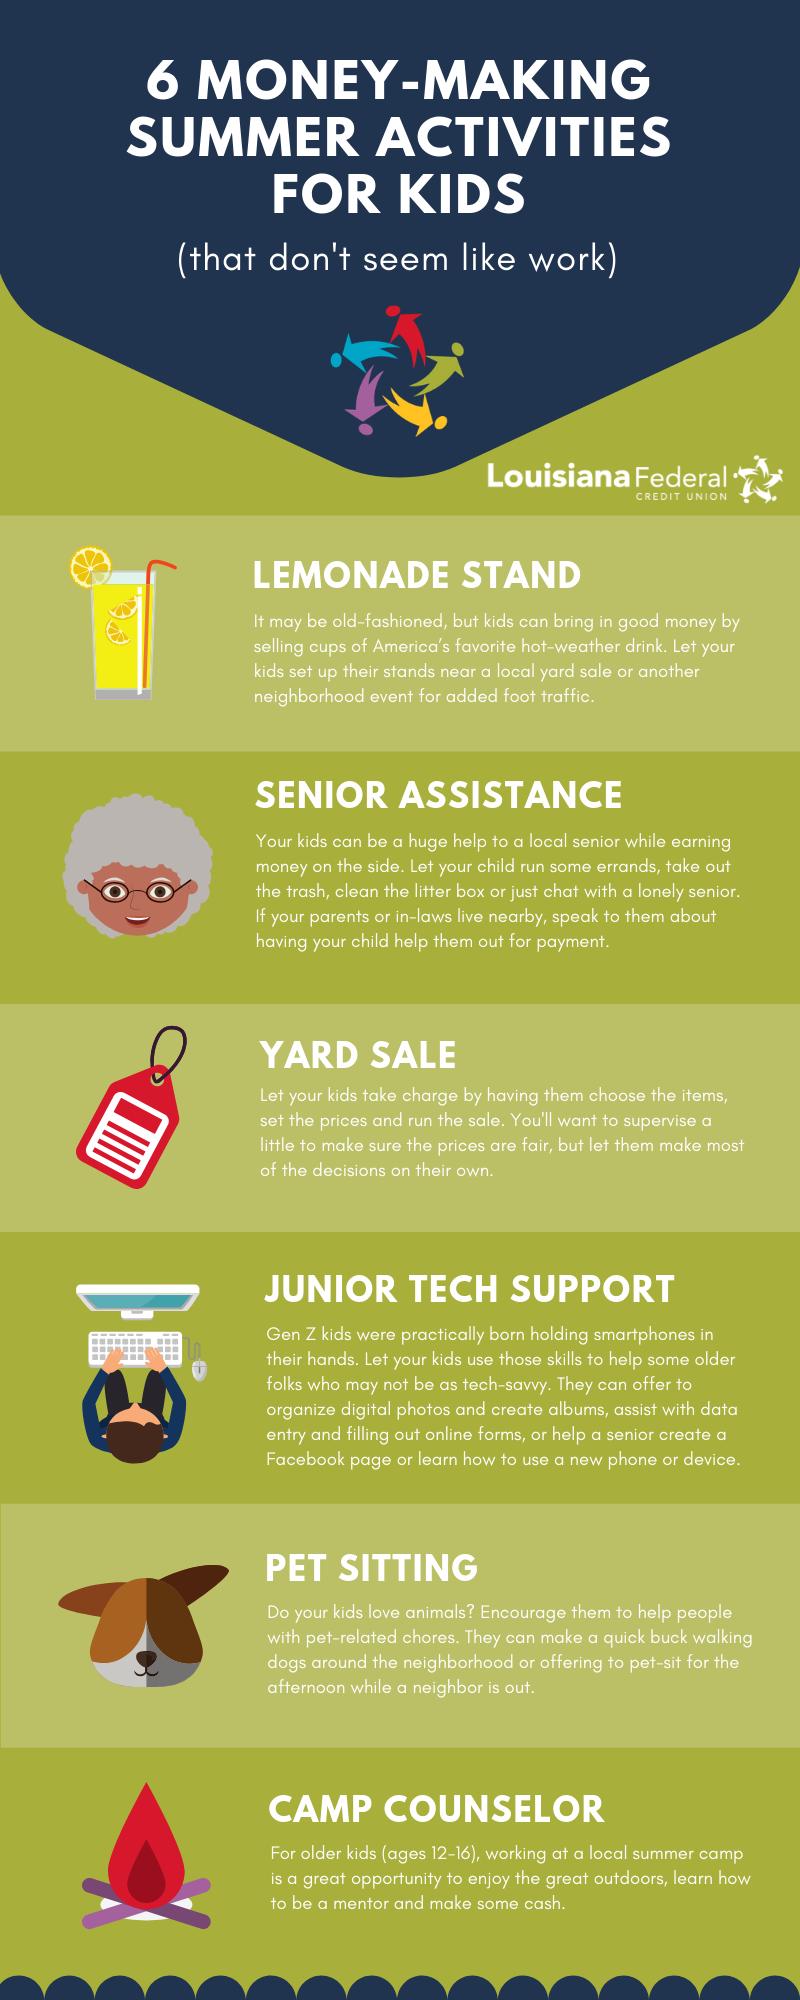 6 MONEY-MAKING SUMMER ACTIVITIES FOR YOUR KIDS-1